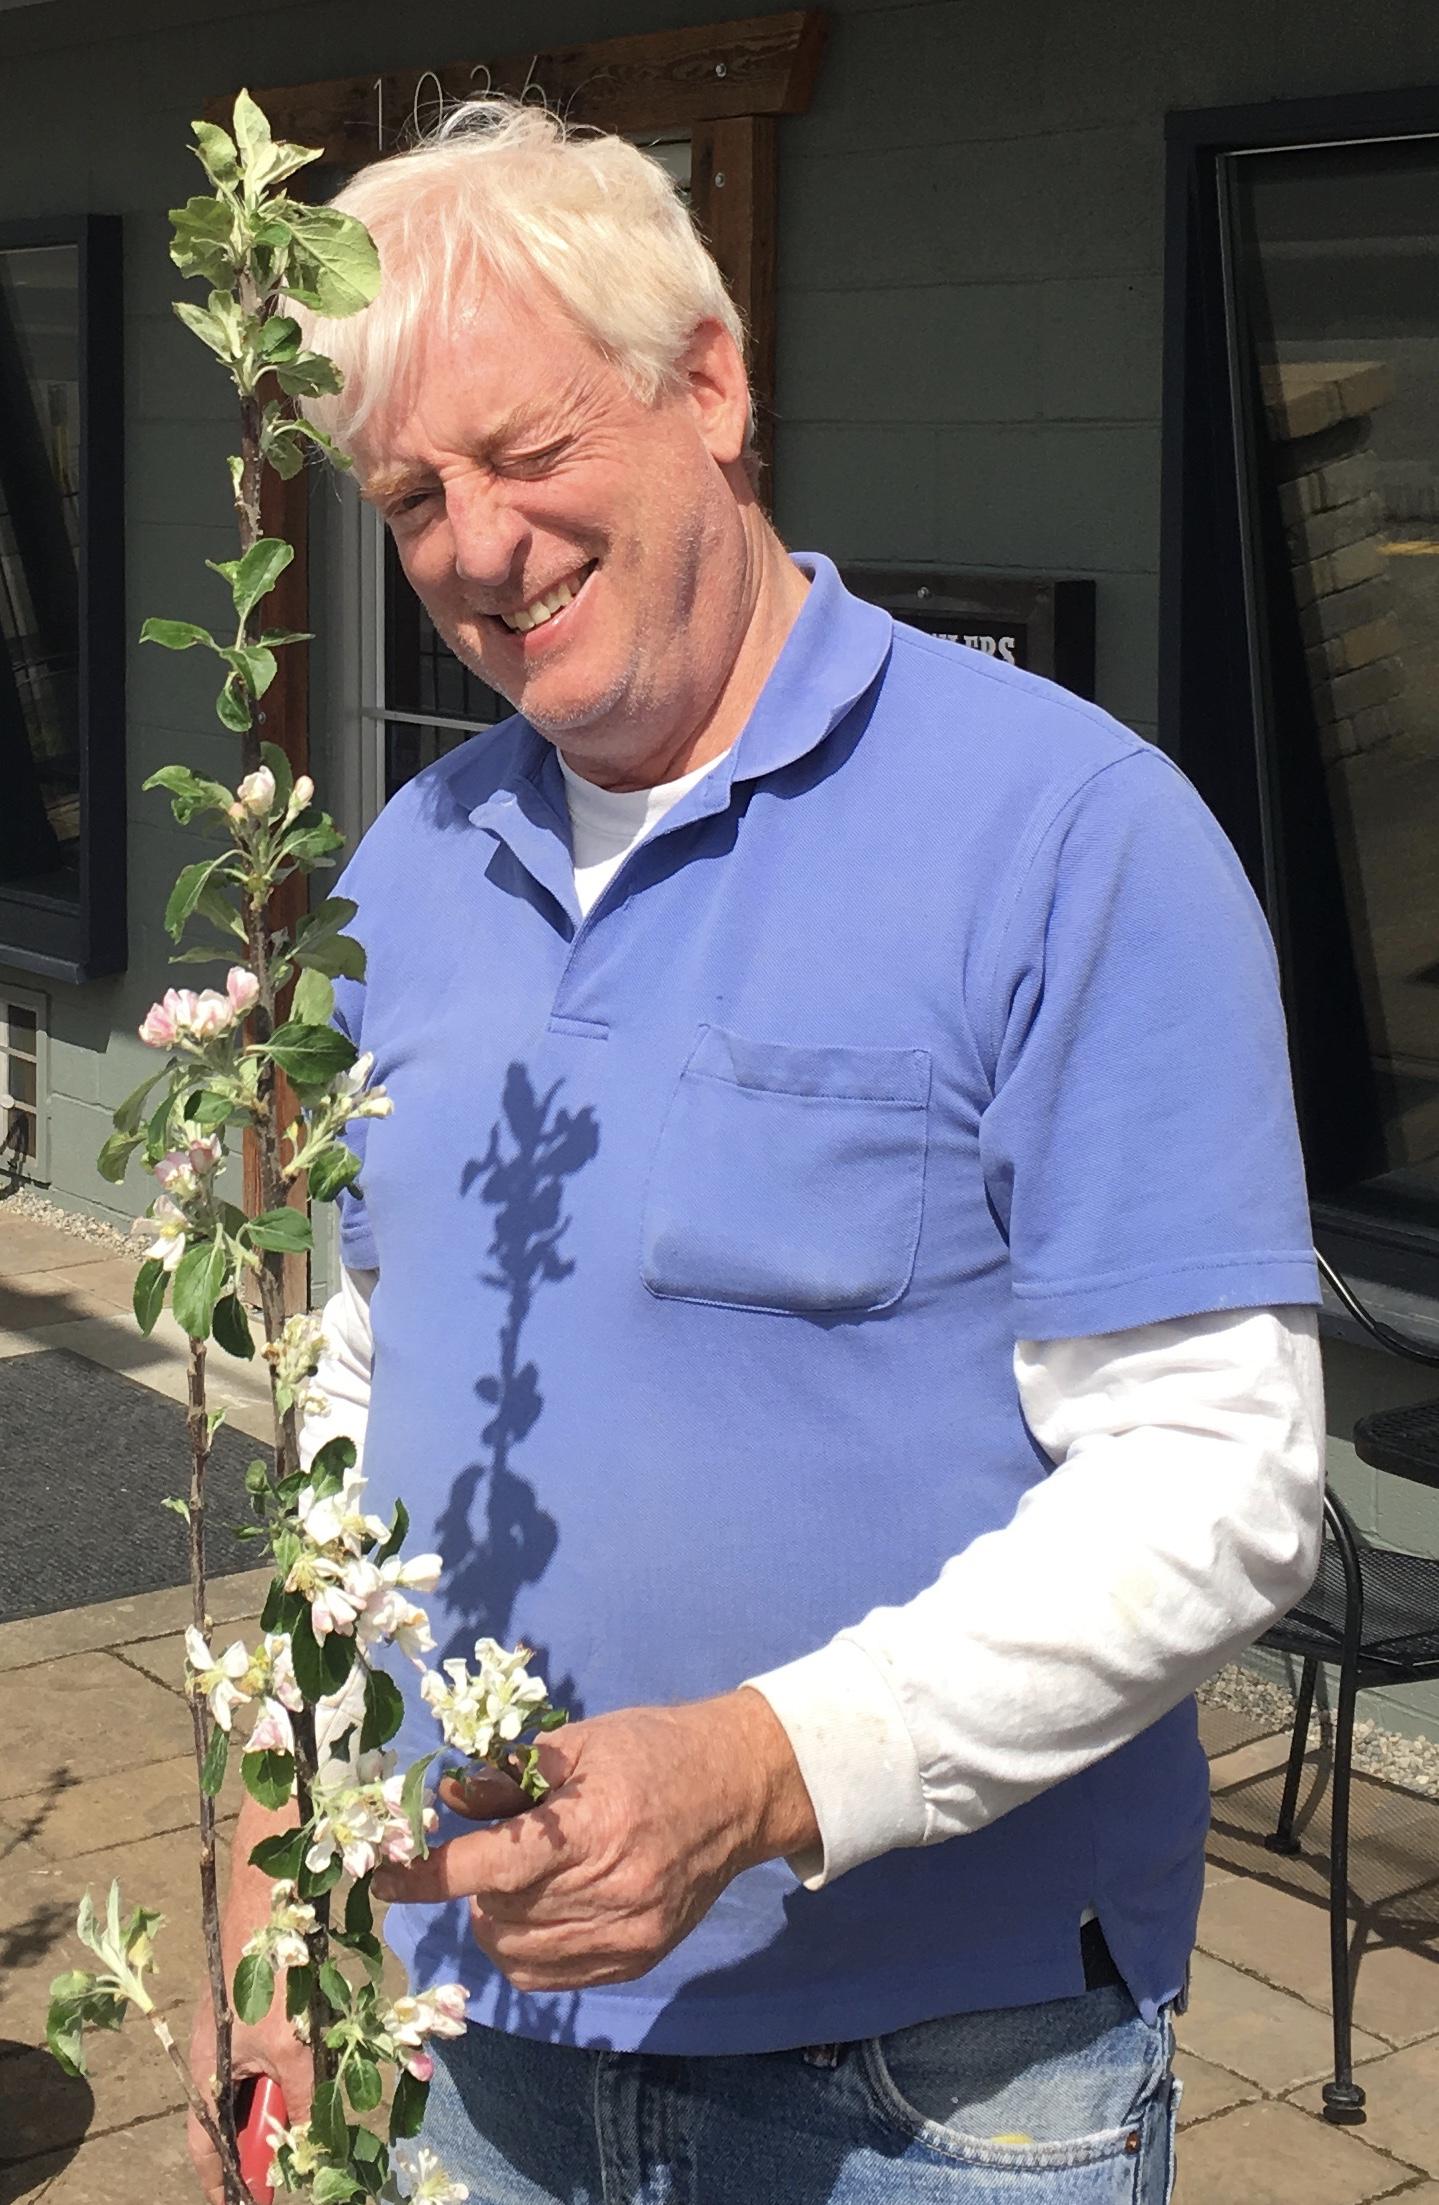 Mark Bailey - Cidermaker, orchardist, dad, crazy guy